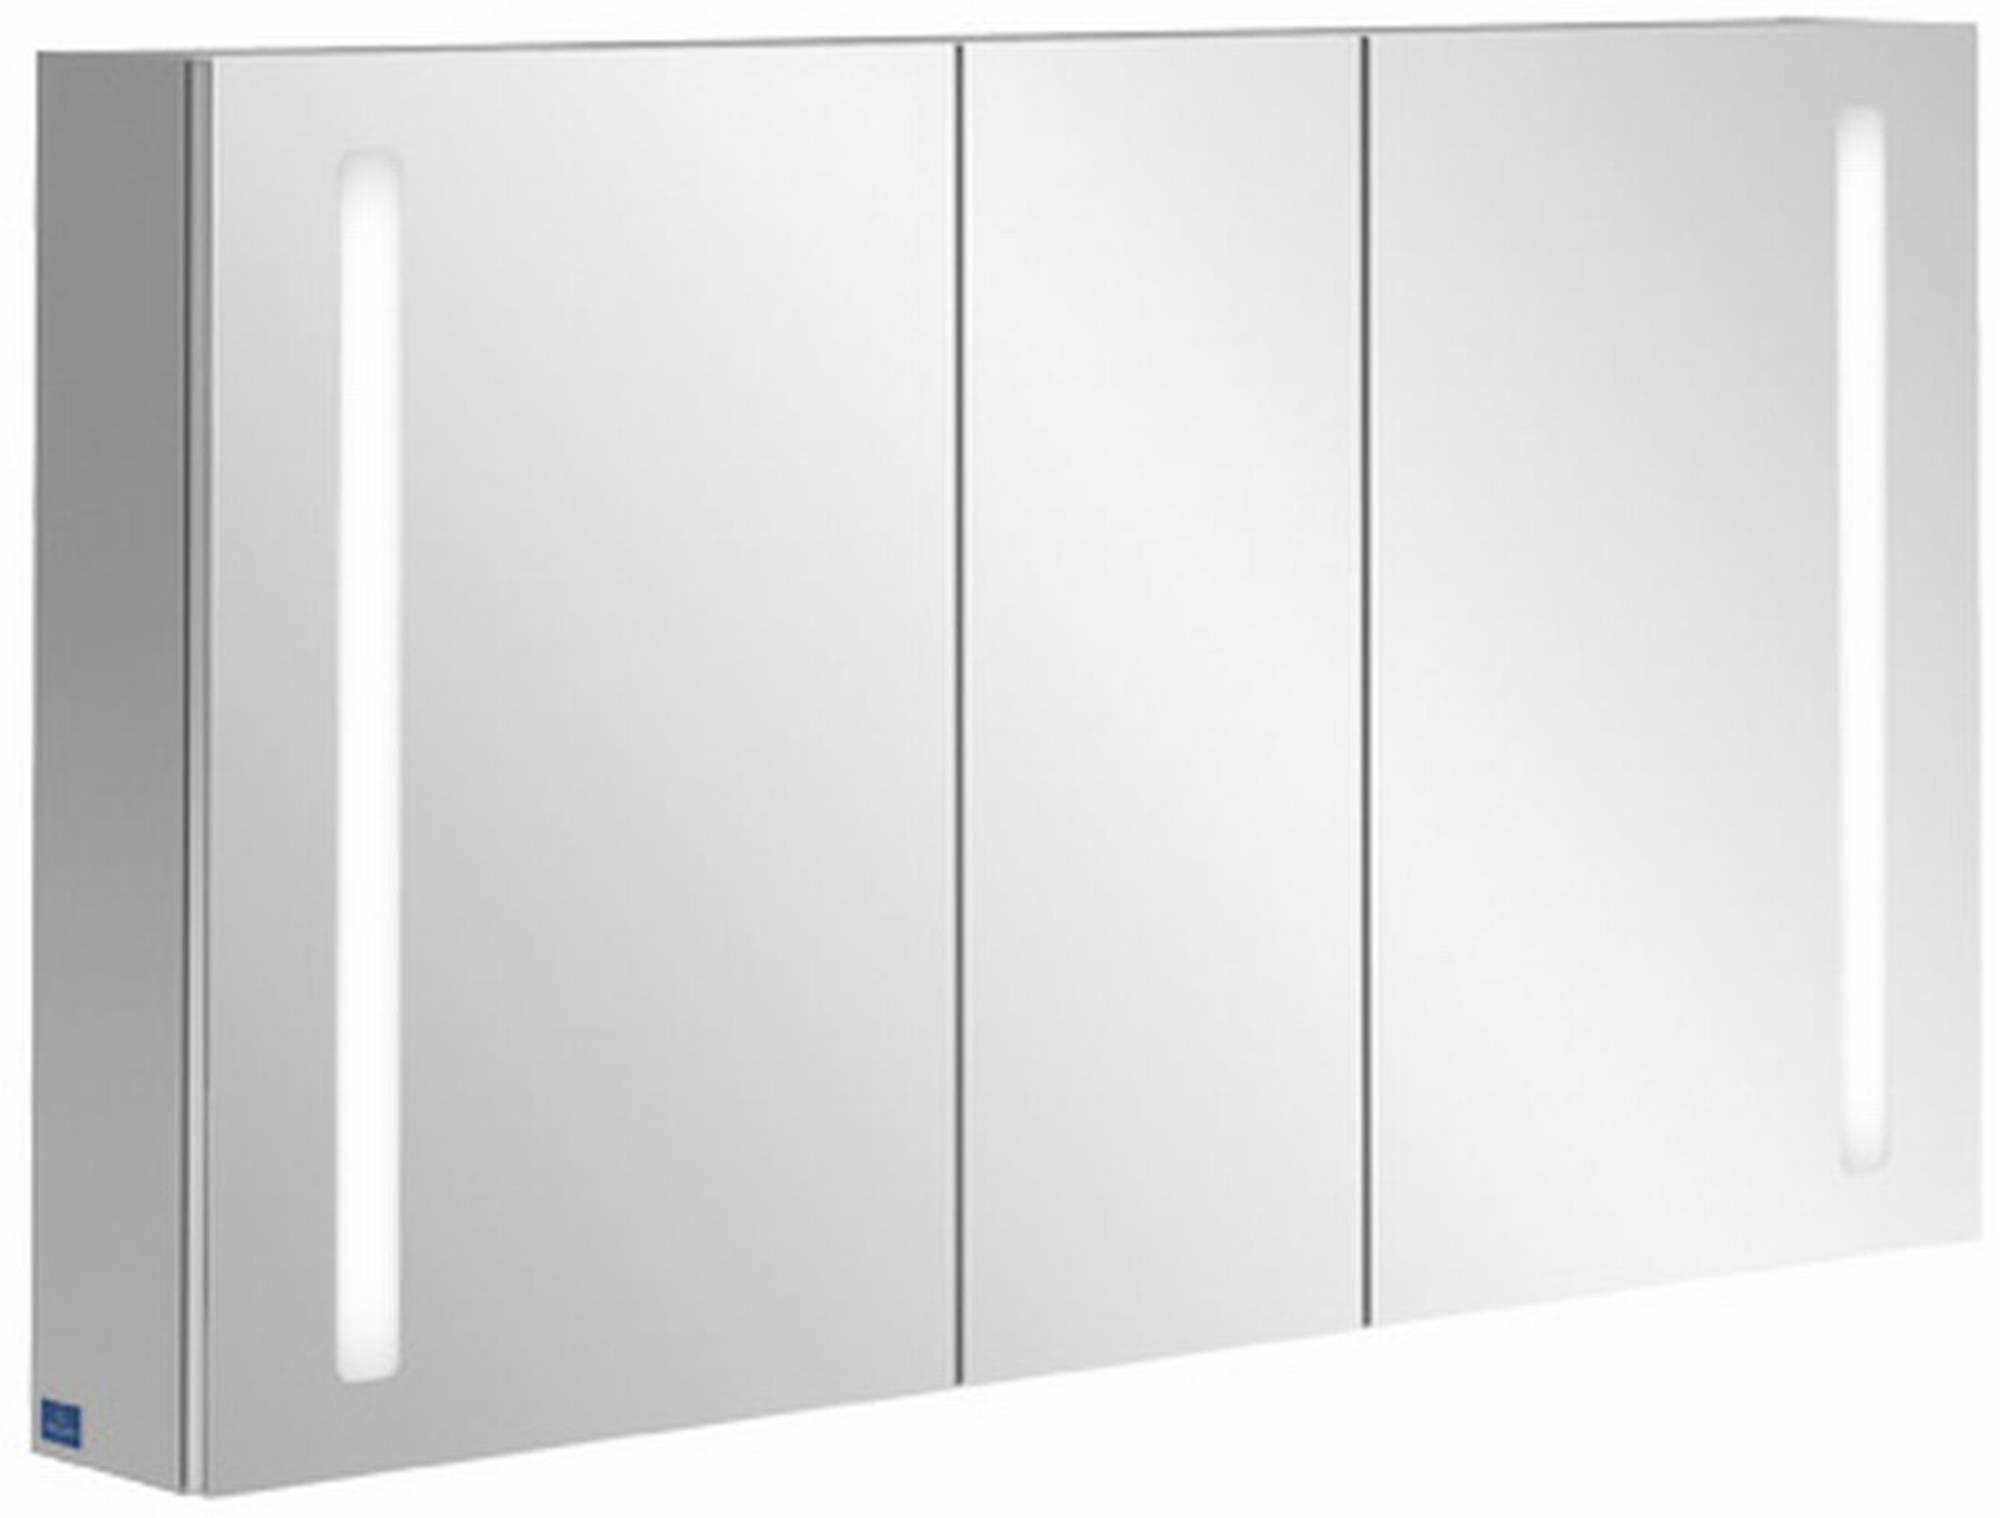 Villeroy & boch My view 14 spiegelkast 130x75 cm, 3 deuren en led verlichting